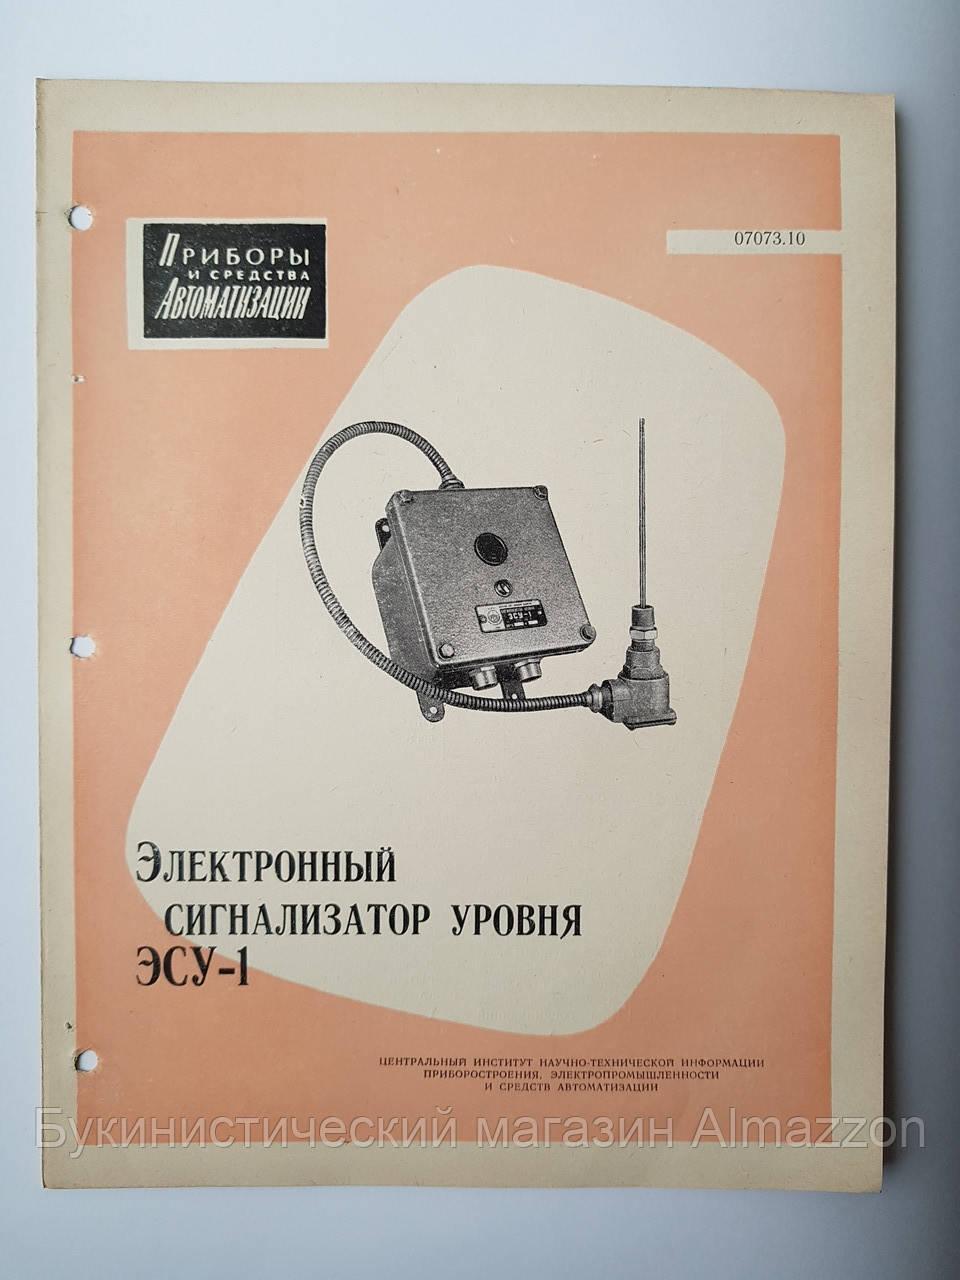 "Журнал (Бюллетень) ""Электронный сигнализатор уровня ЭСУ-1  07073.10"" 1963 г."